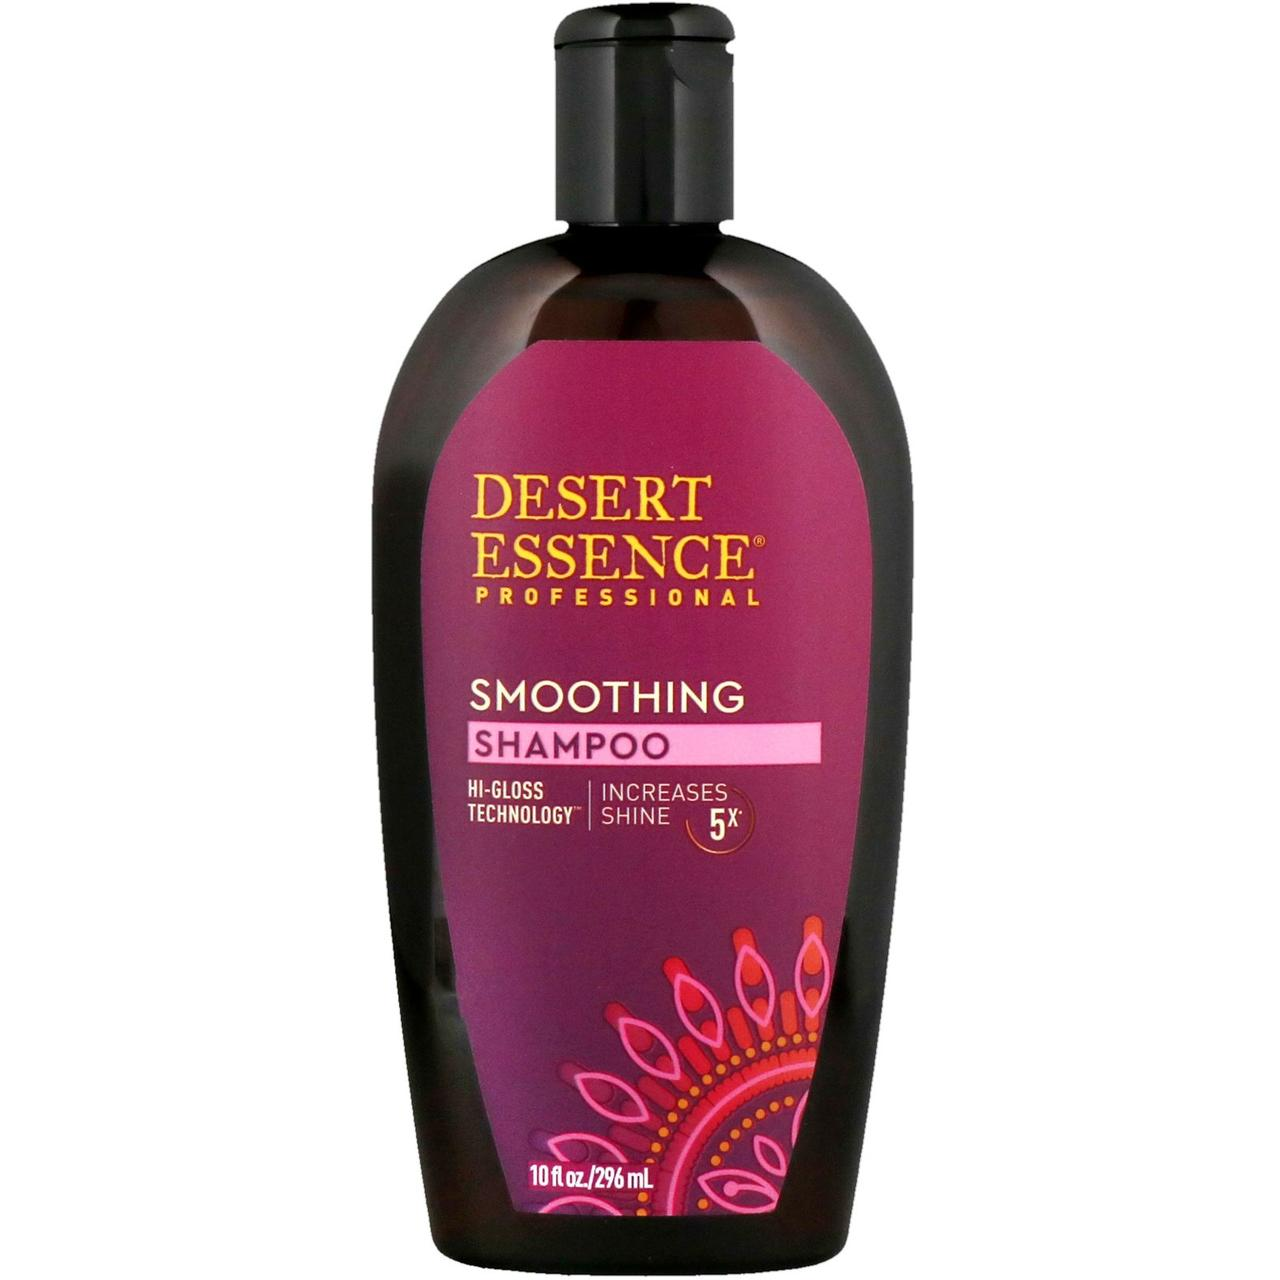 Разглаживающий шампунь (296 ml) Desert Essence